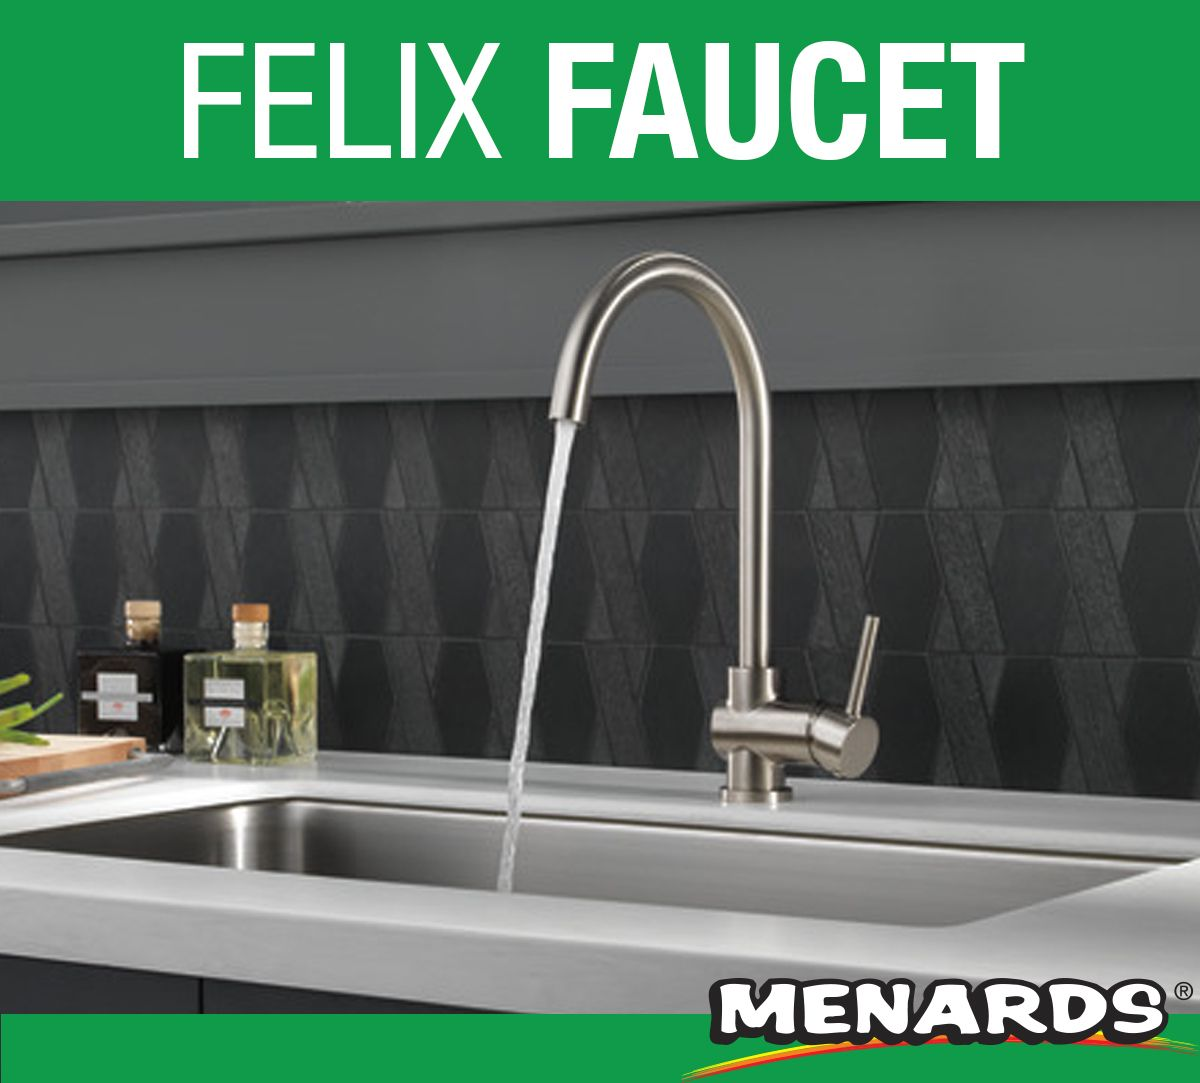 the delta felix faucet makes an